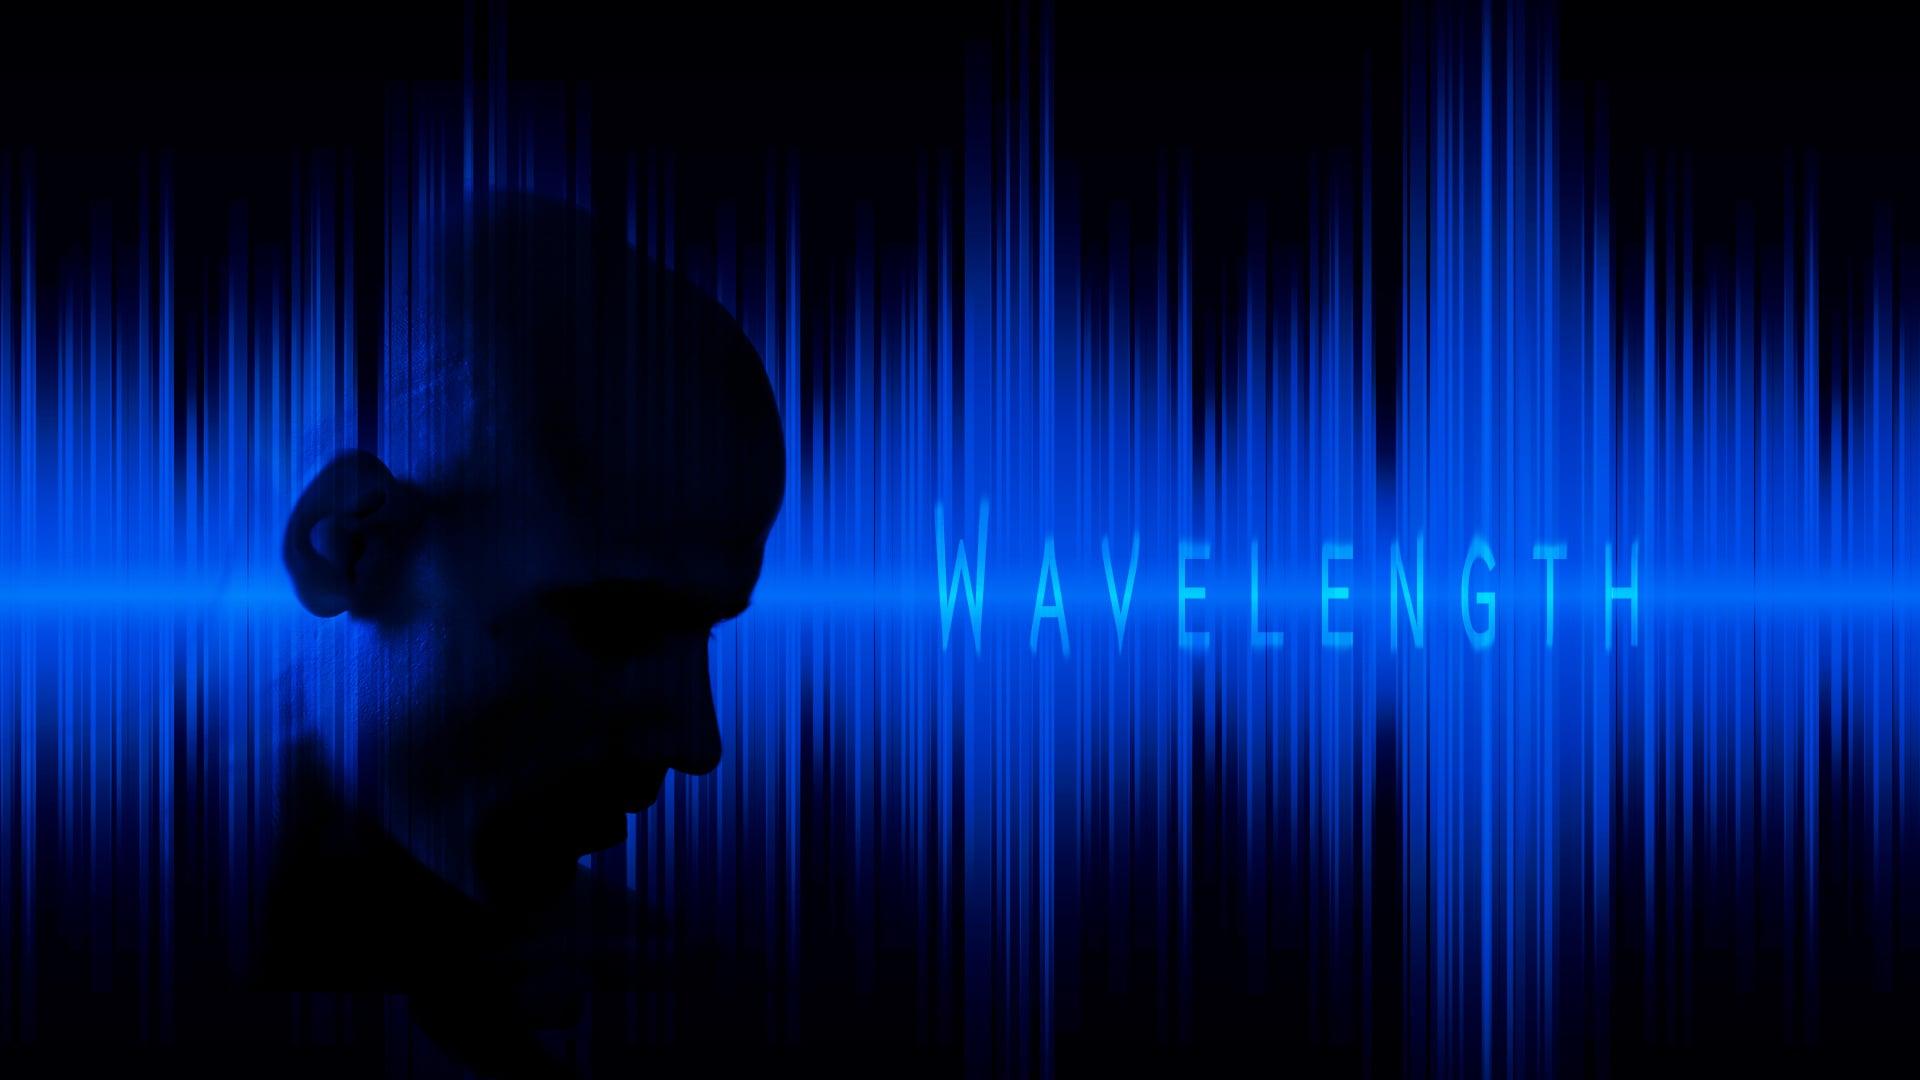 Wavelength - Week 4